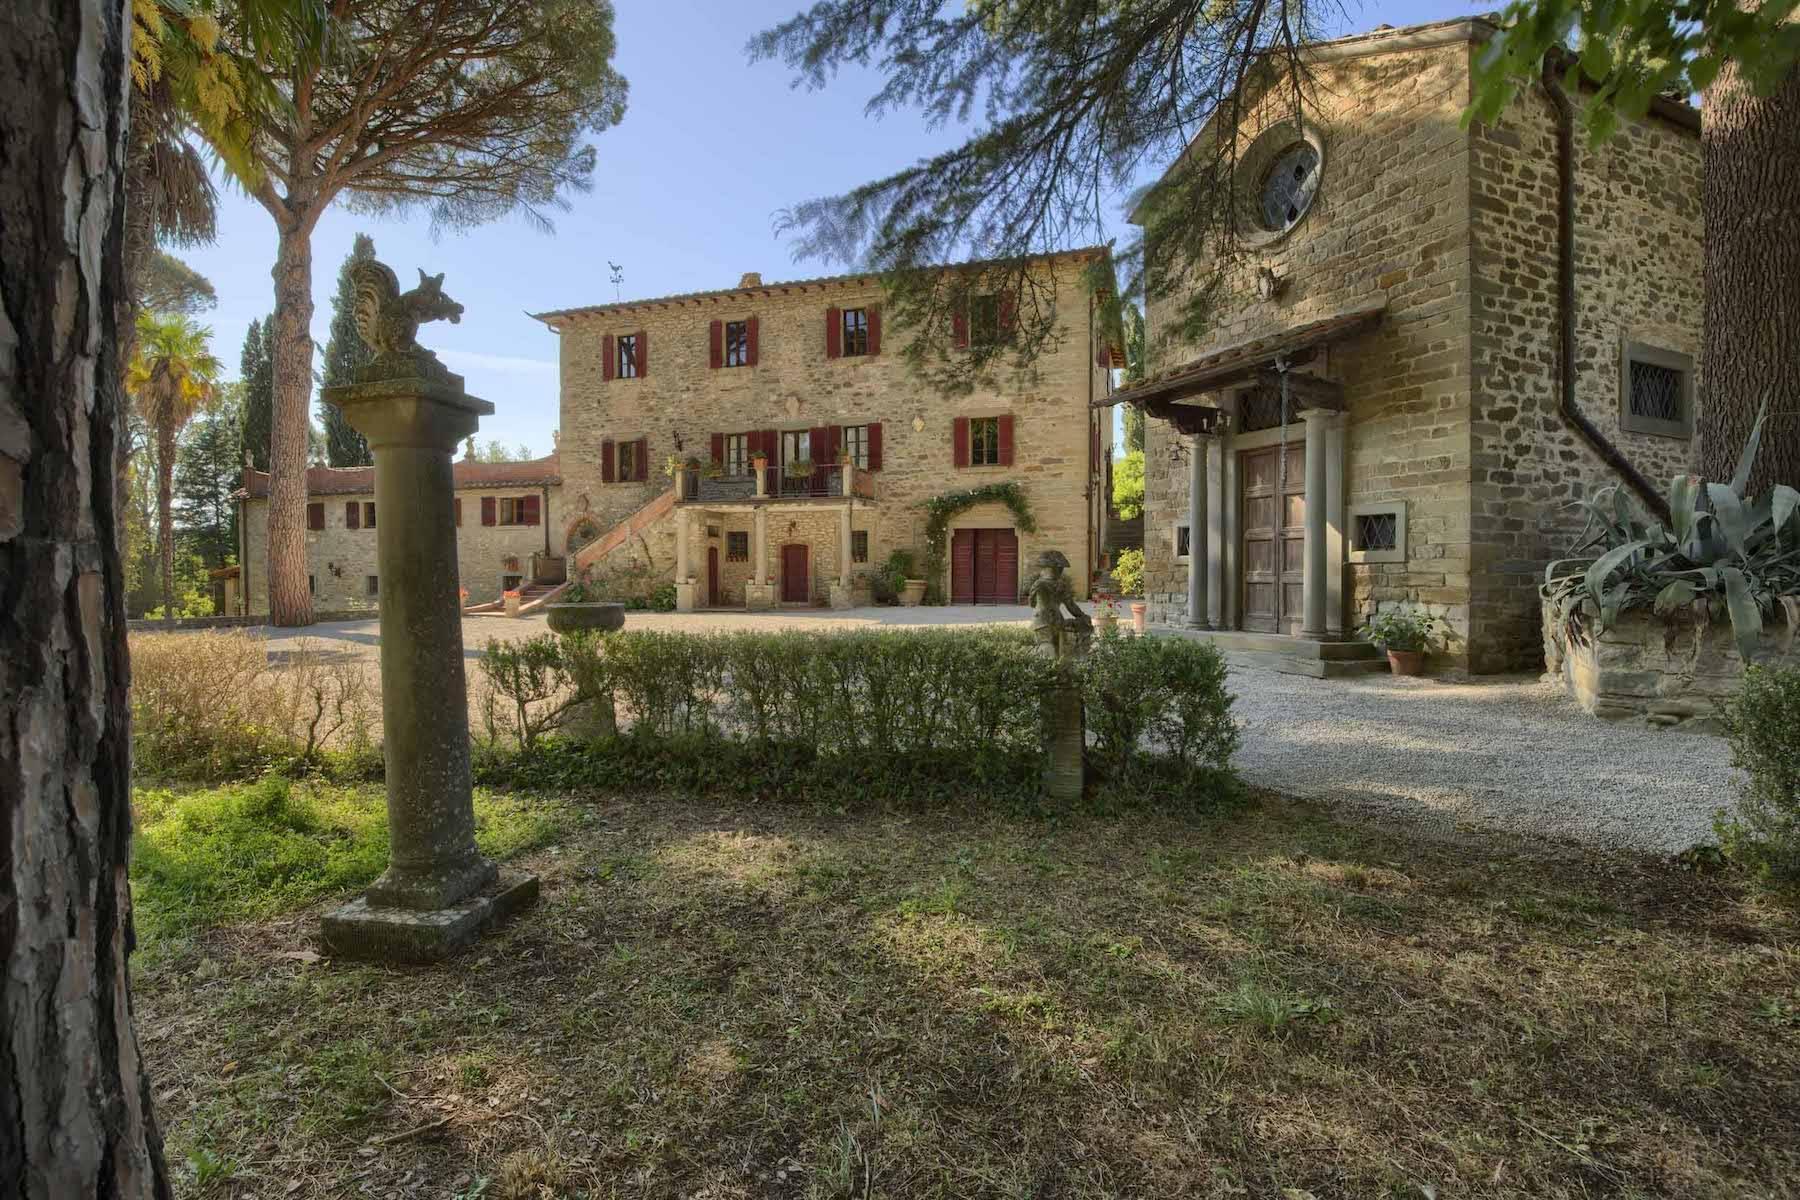 Historische Villa aus dem 1700 in Cortona - 3